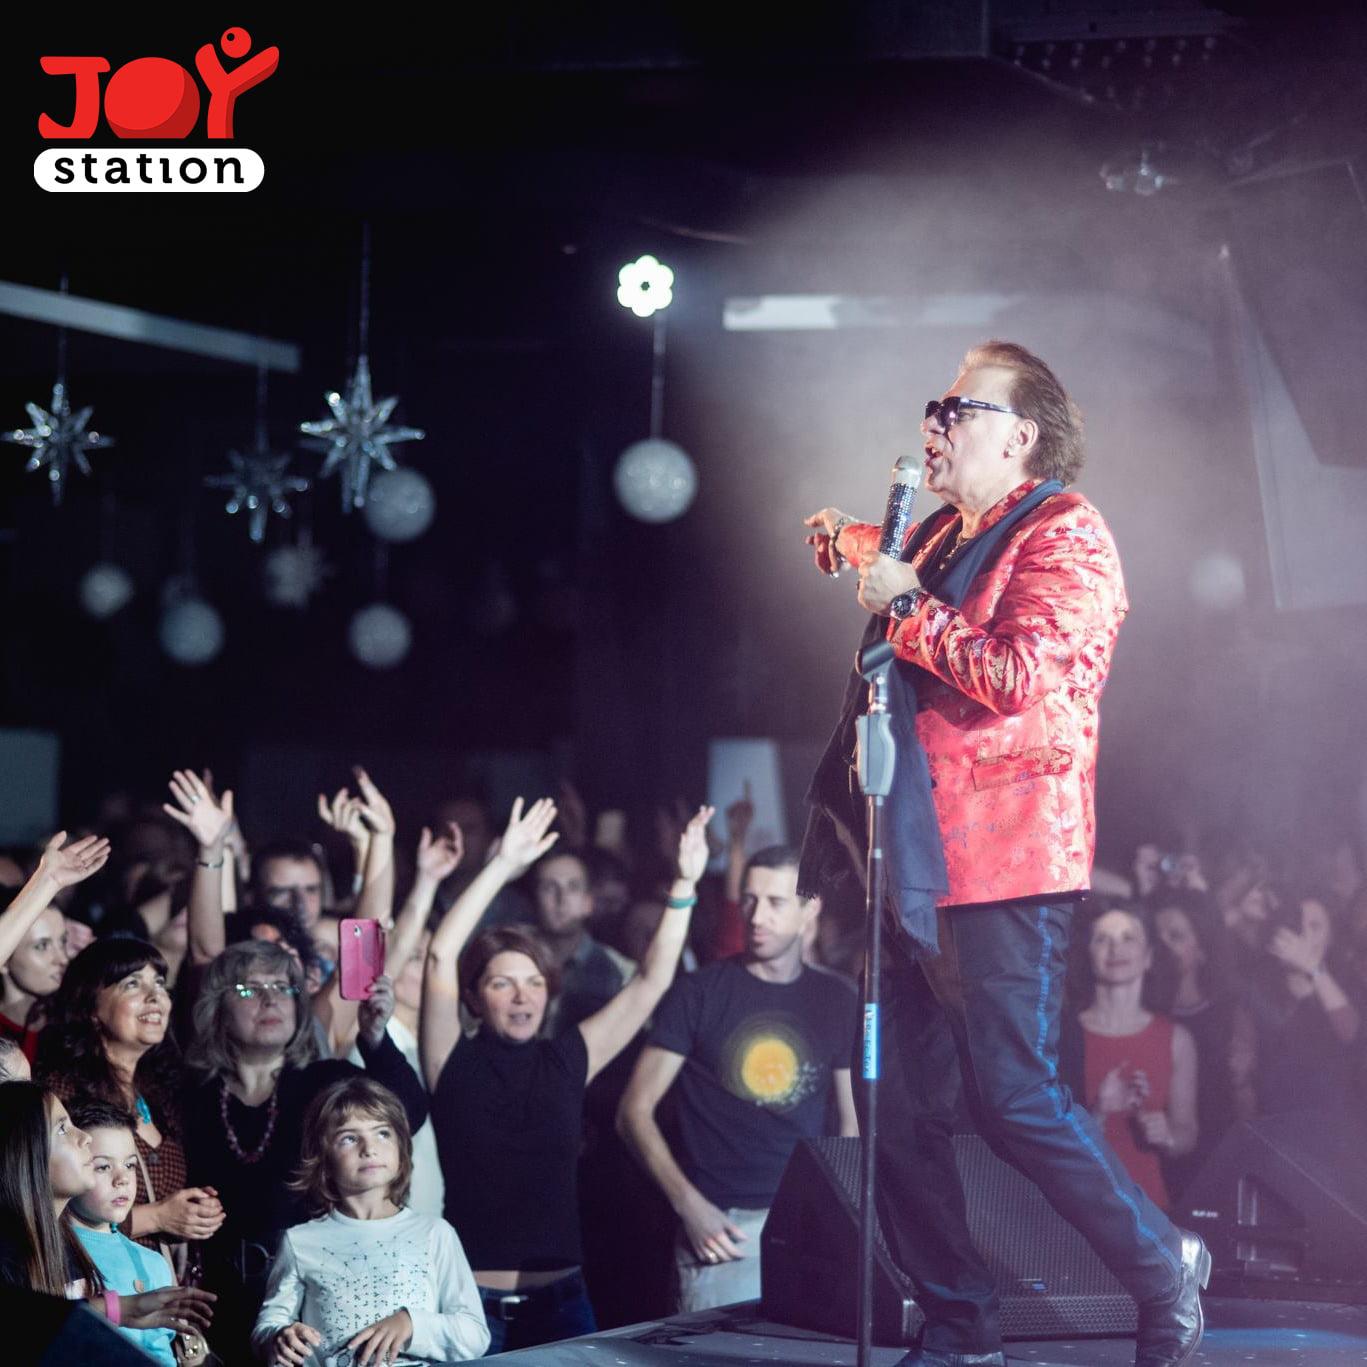 Рестарт на концертния сезон в Joy Station с Миро и Васил Найденов 137